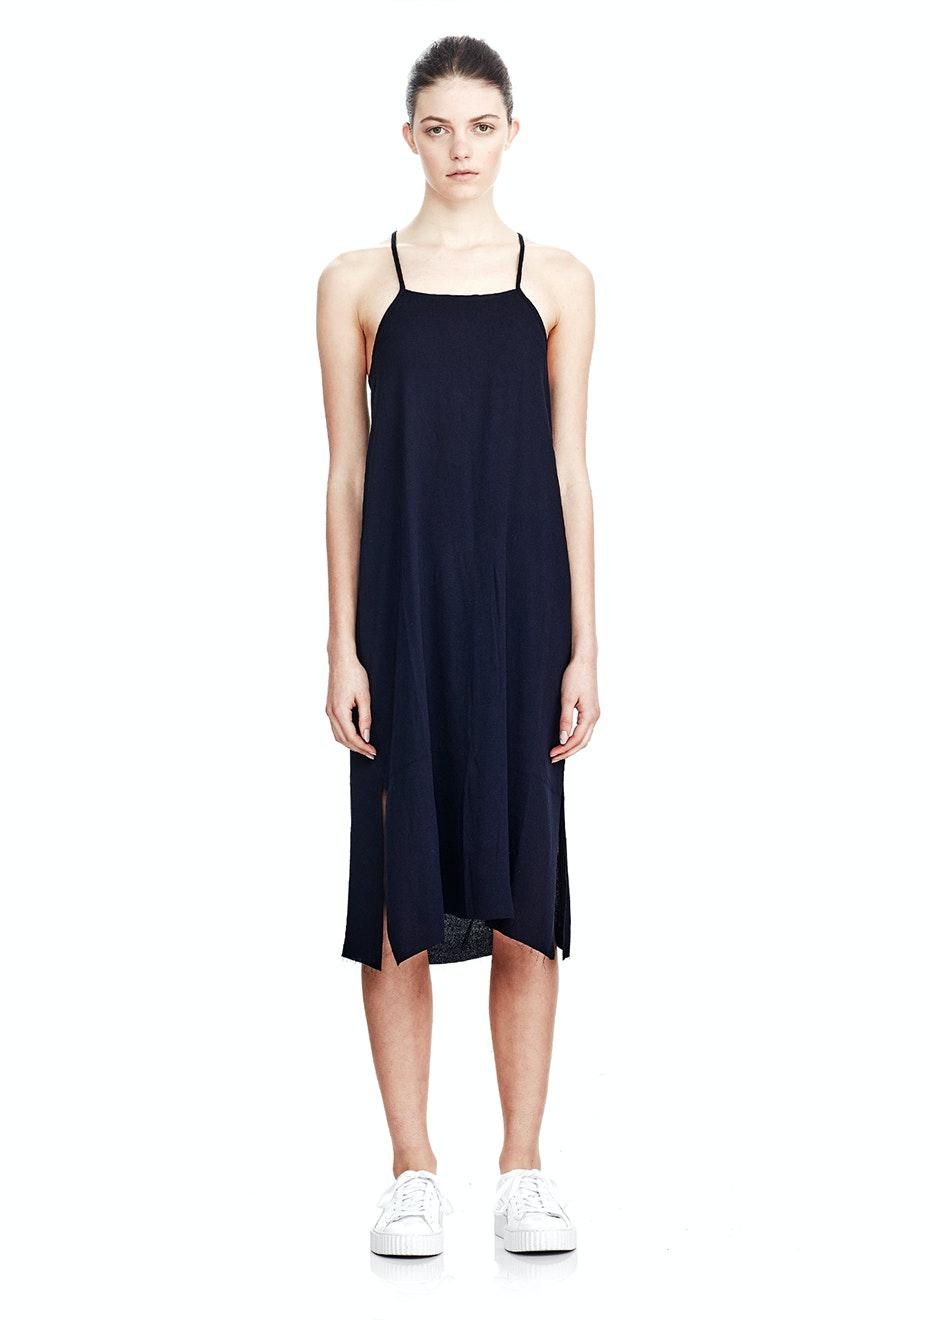 Commoners - Crossover Slip Dress - Navy